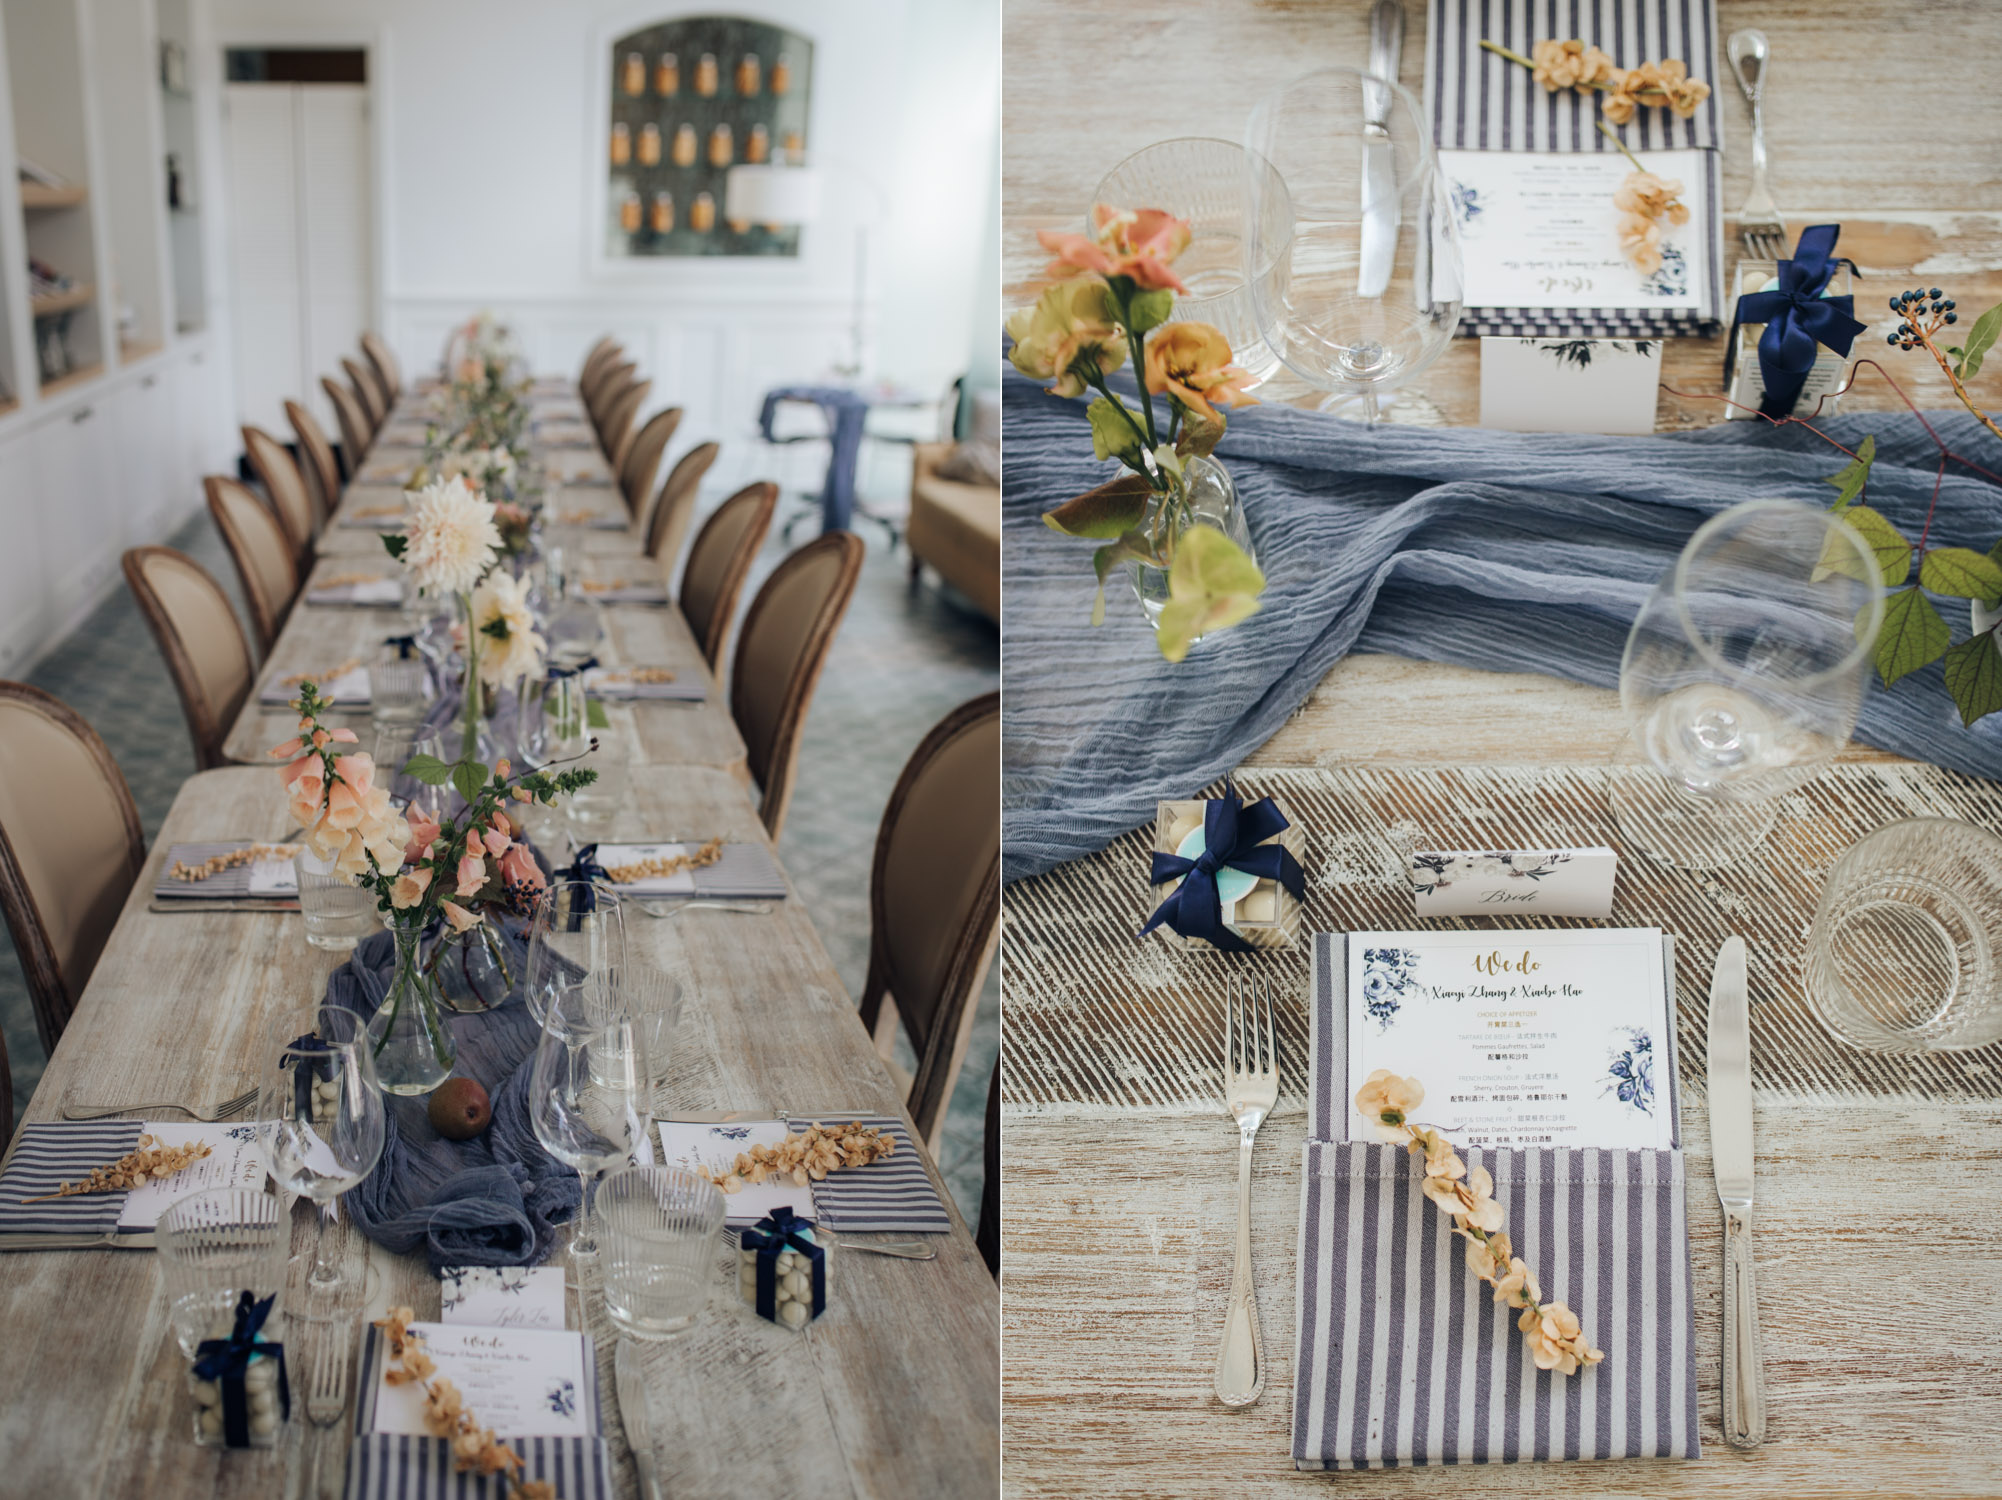 Colette grand cafe Wedding Reception details Table